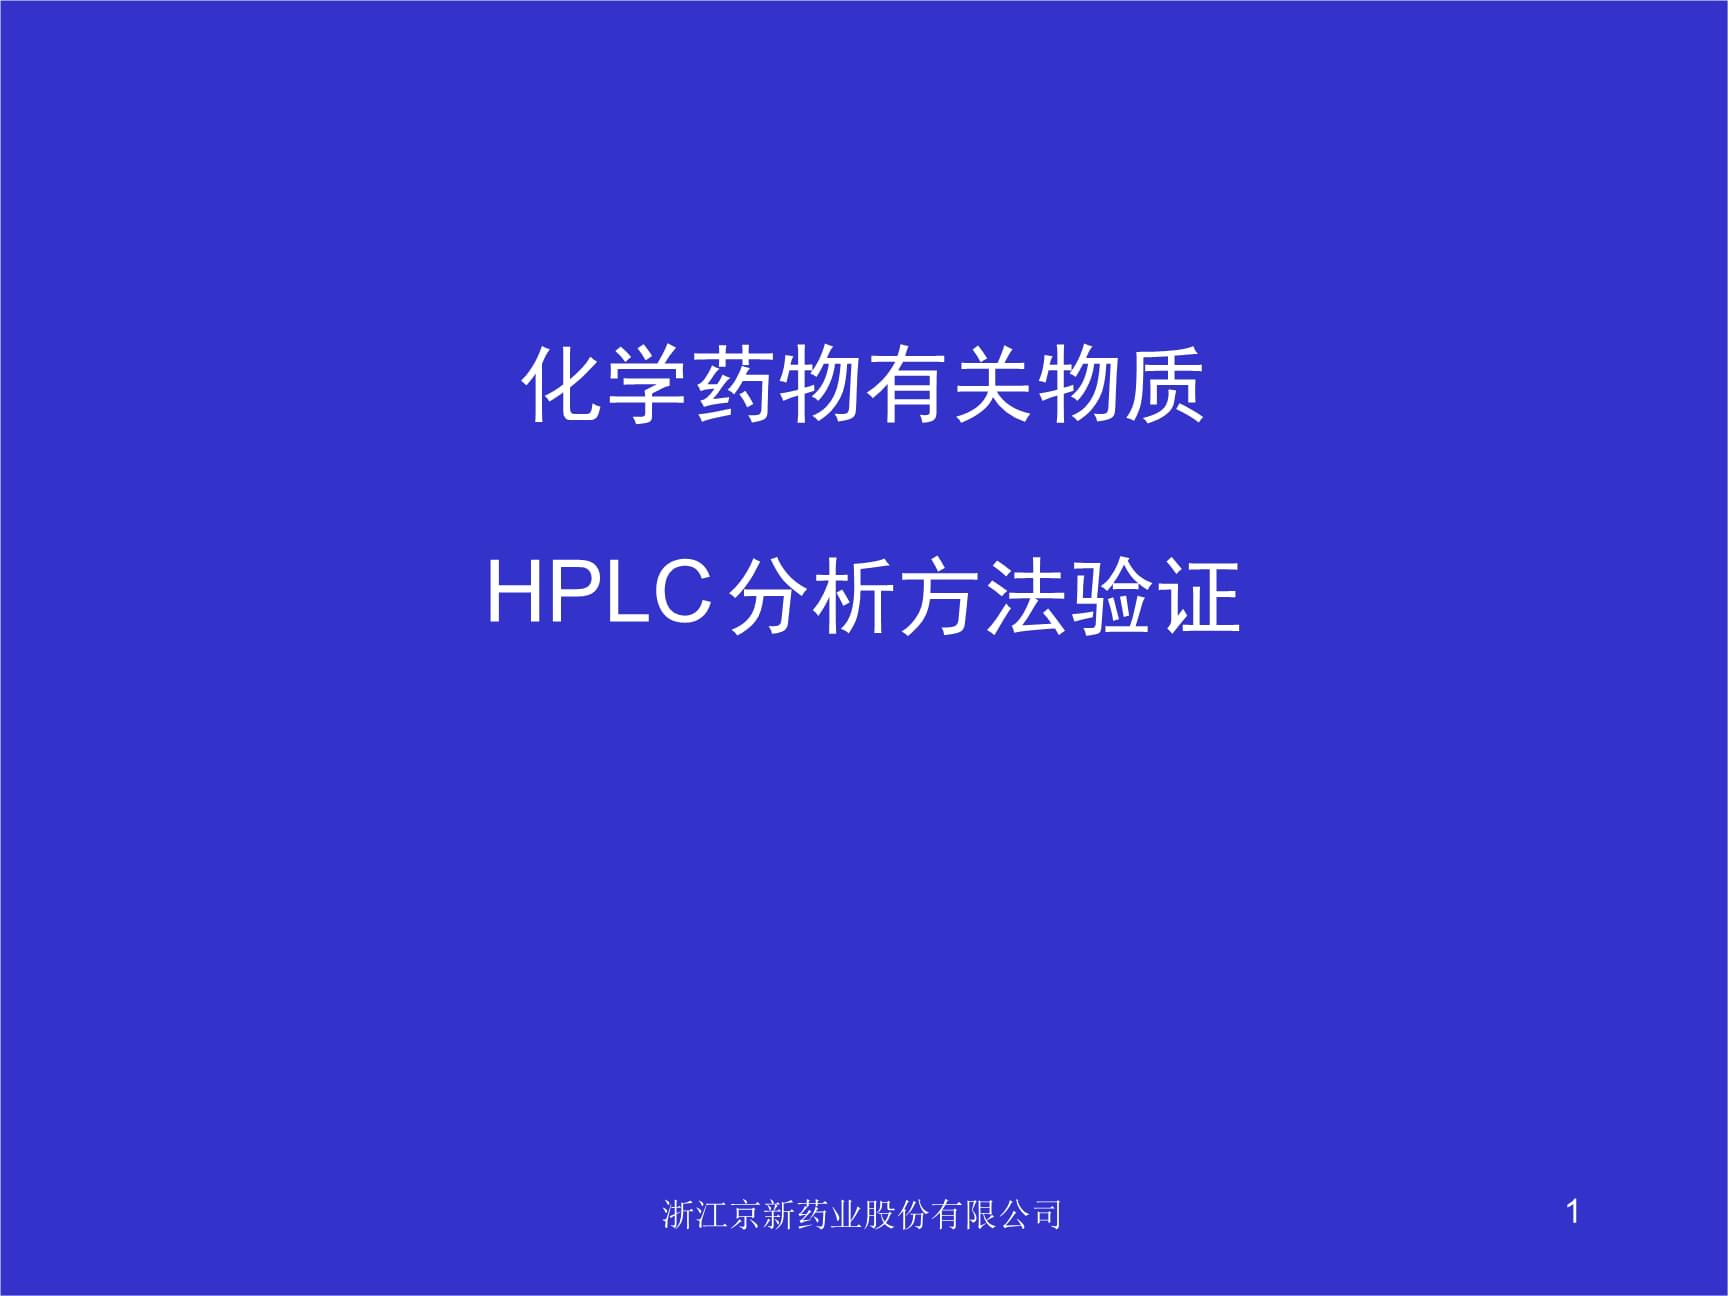 HPLC有关物质分析方法验证参考幻灯片.ppt